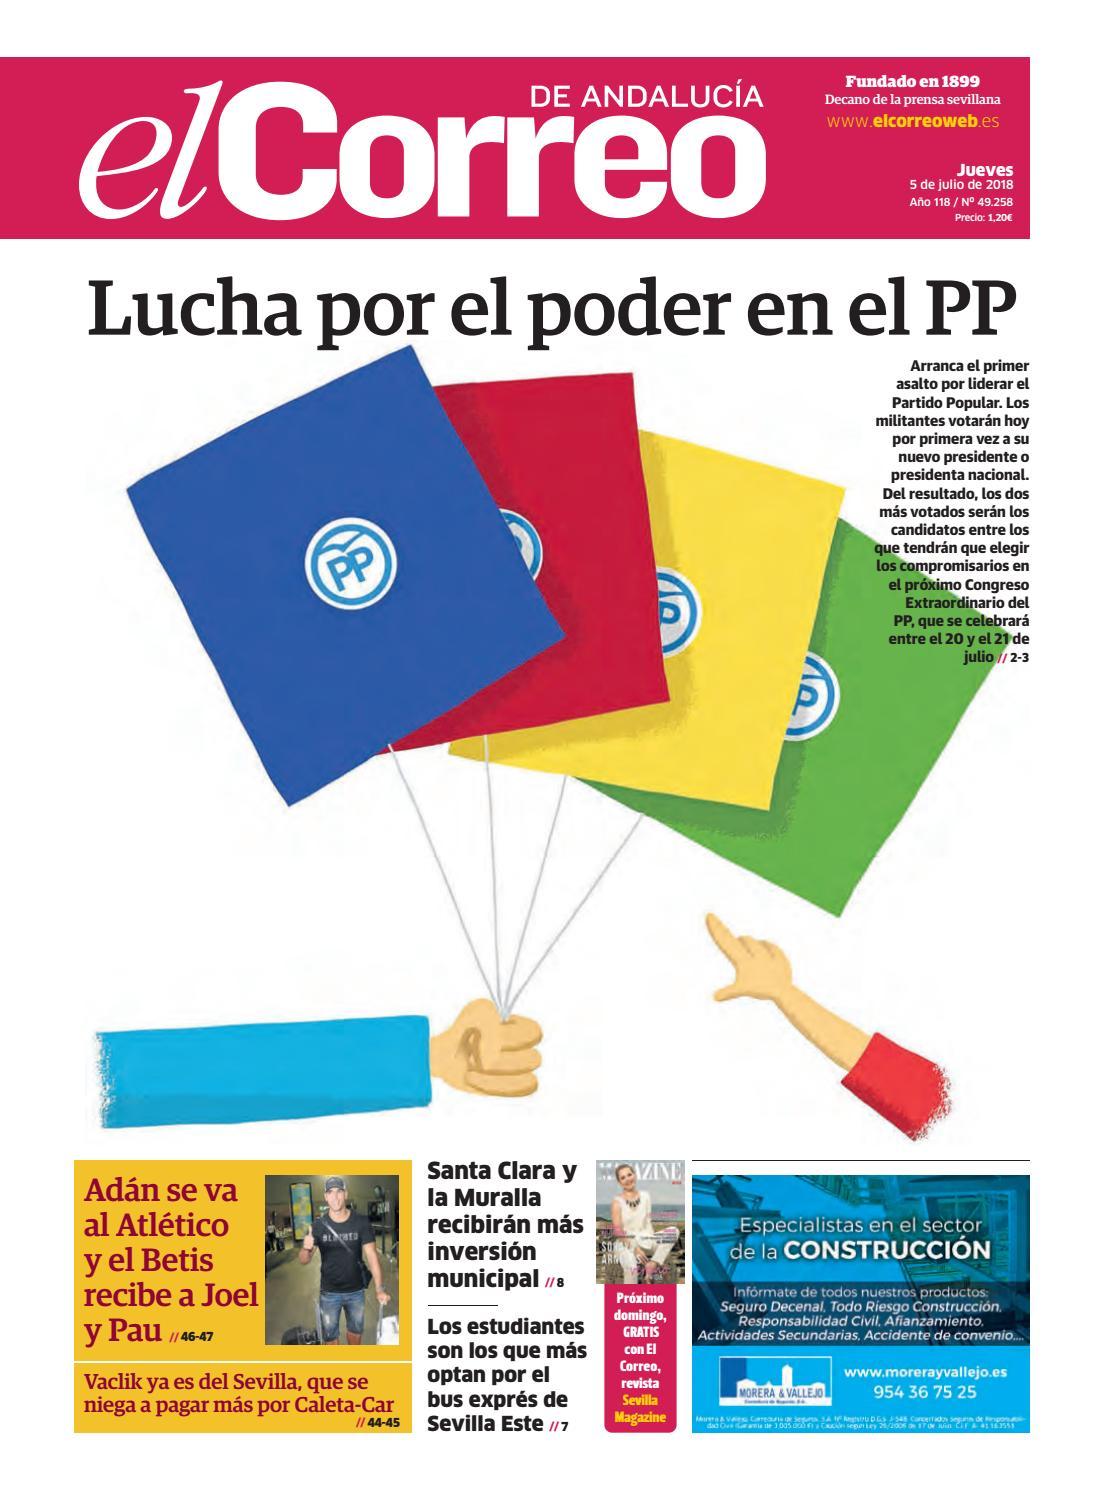 18b1f0ca6 05.07.2018 El Correo de Andalucía by EL CORREO DE ANDALUCÍA S.L. - issuu